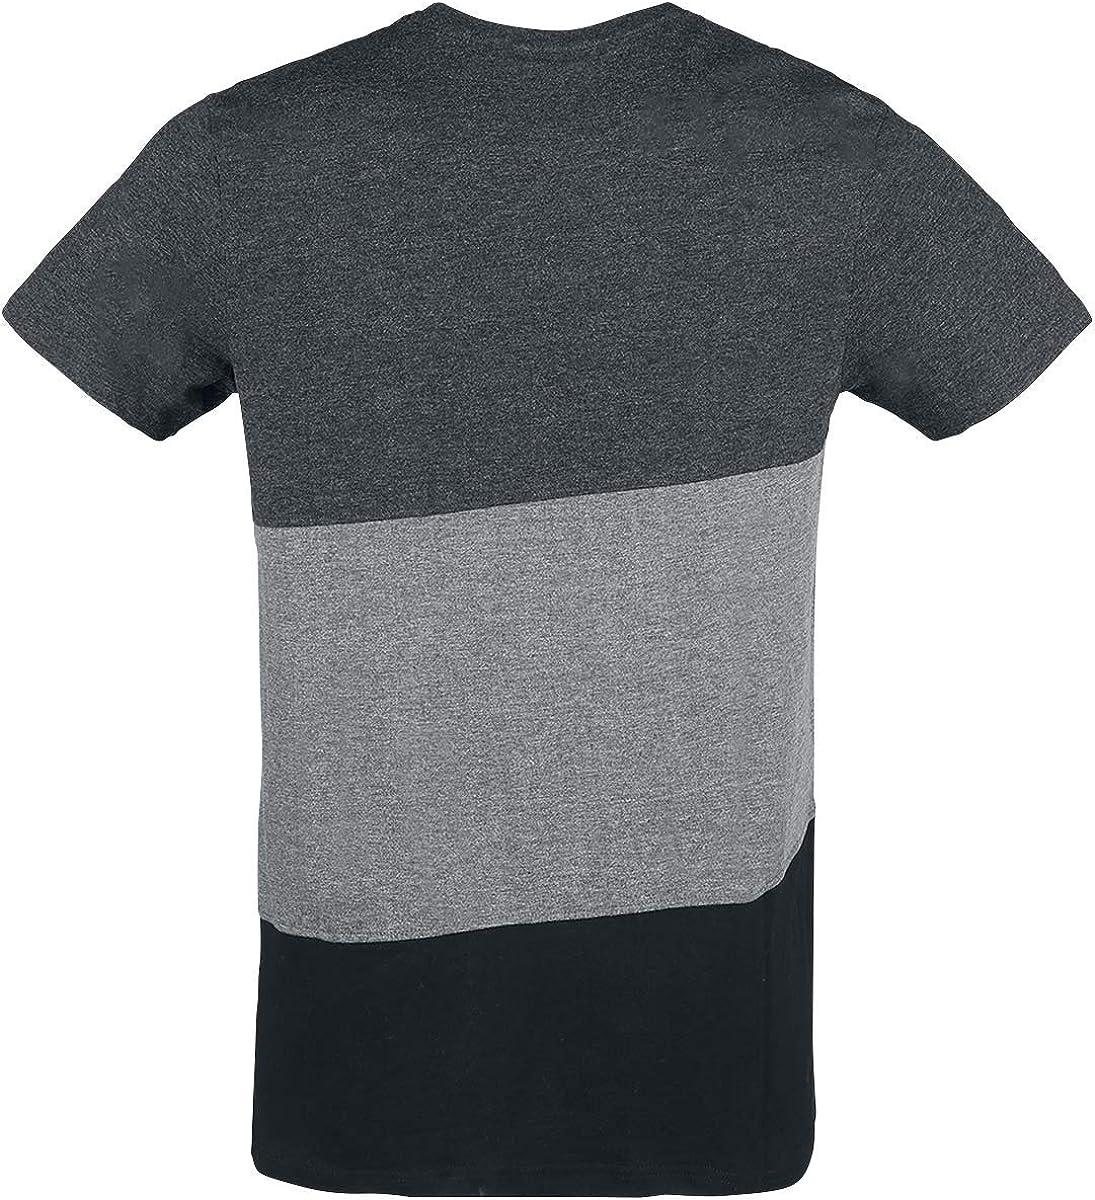 Lonsdale London Walham Camiseta Gris/Negro: Amazon.es: Ropa y ...